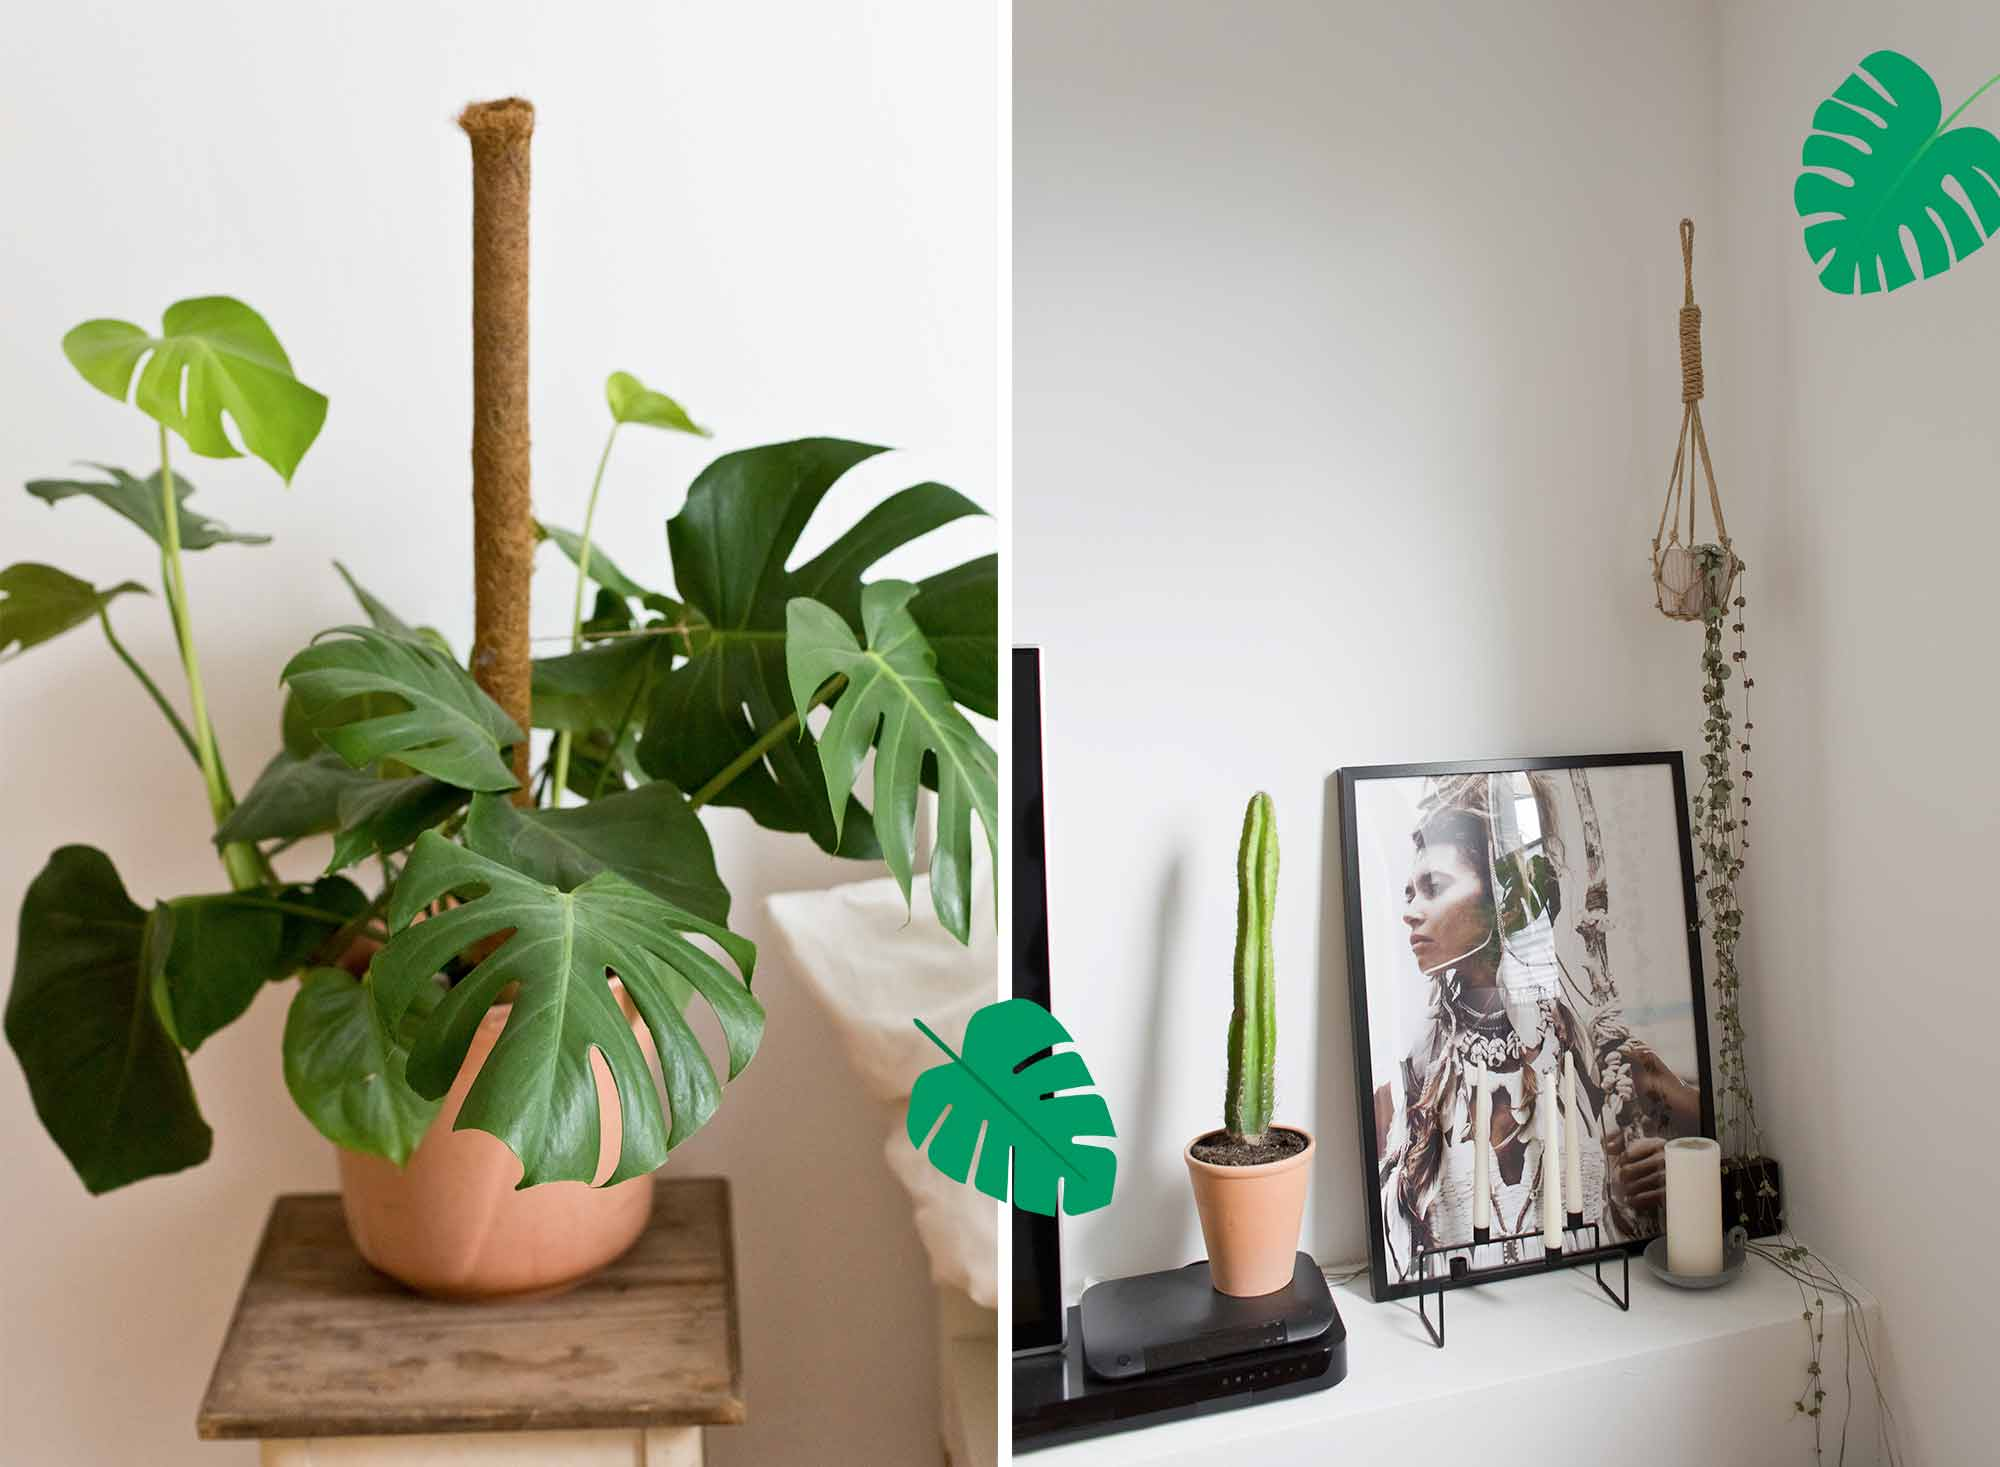 23-pflanzen-Femtastics_Altbremerhausmomente_4711_10